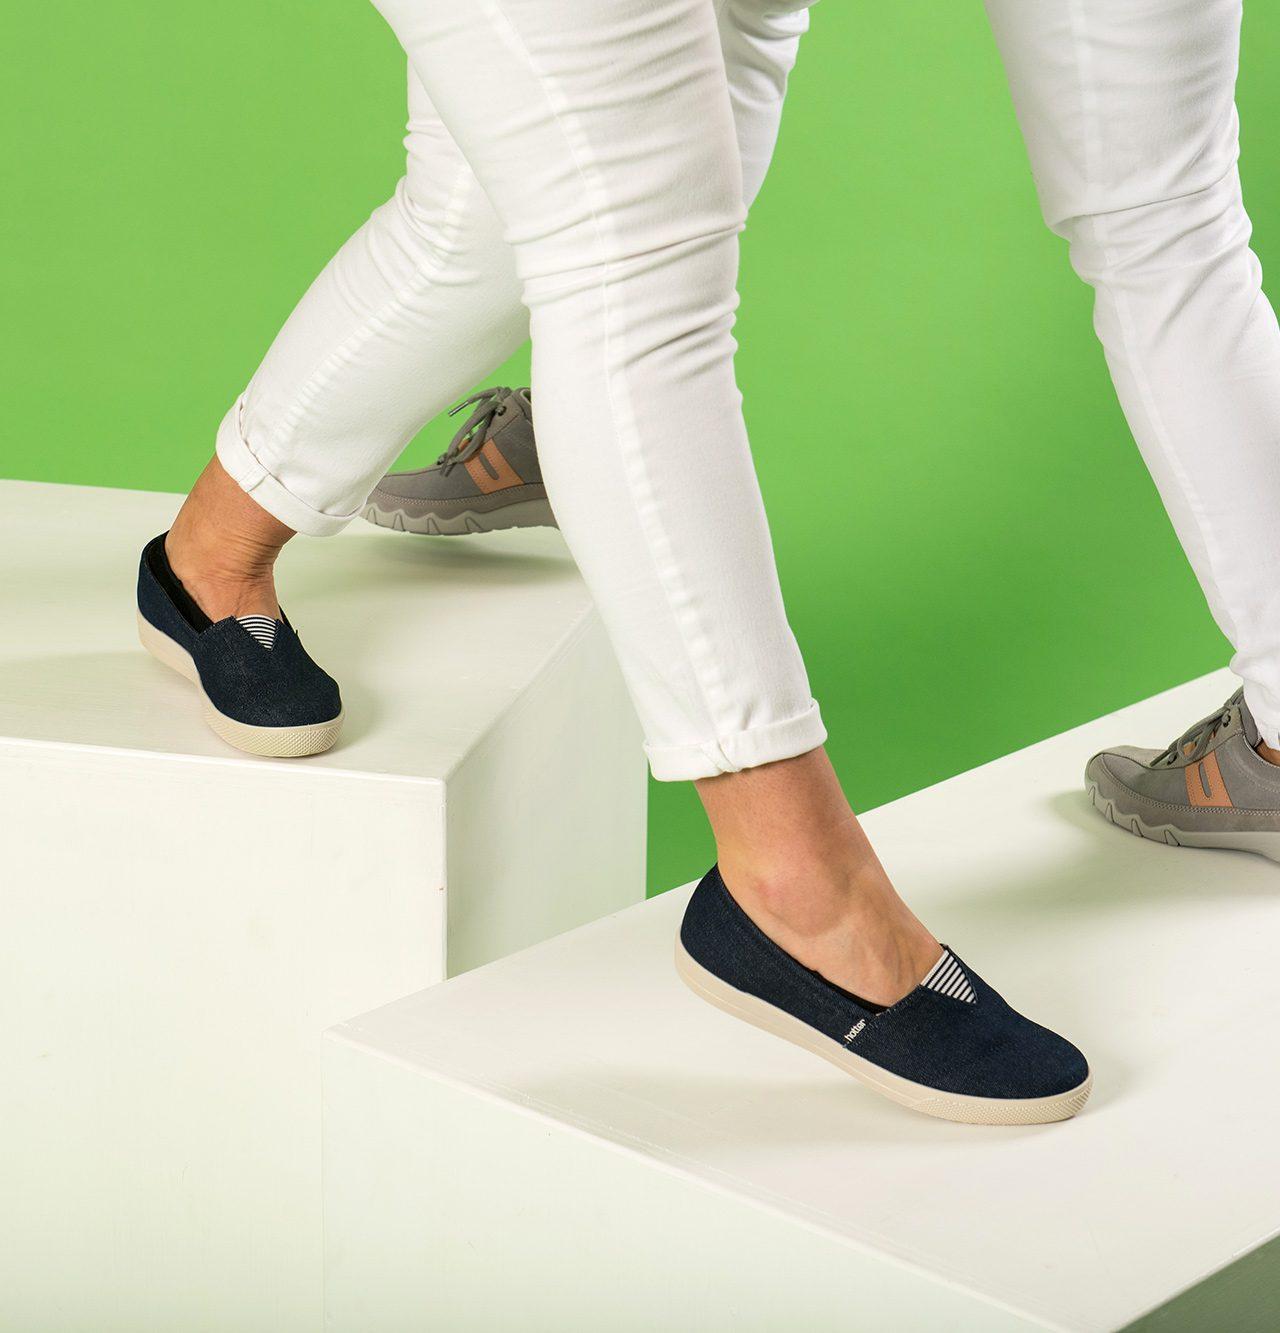 Fashion photographer Jon Parker Lee Hotter Shoes UK